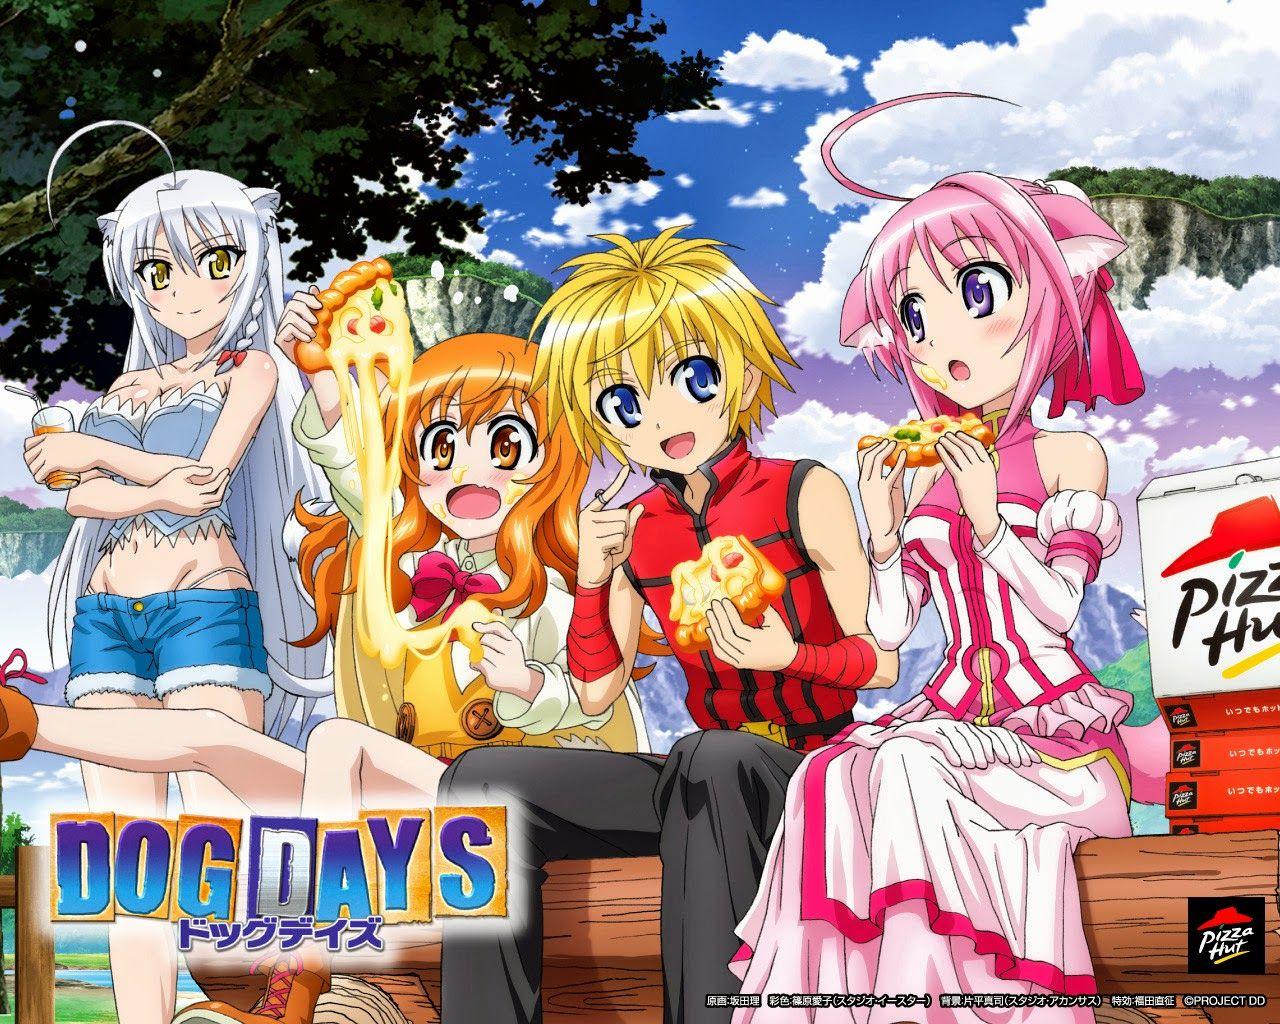 Dog days 1313 mega identi dog days anime dog